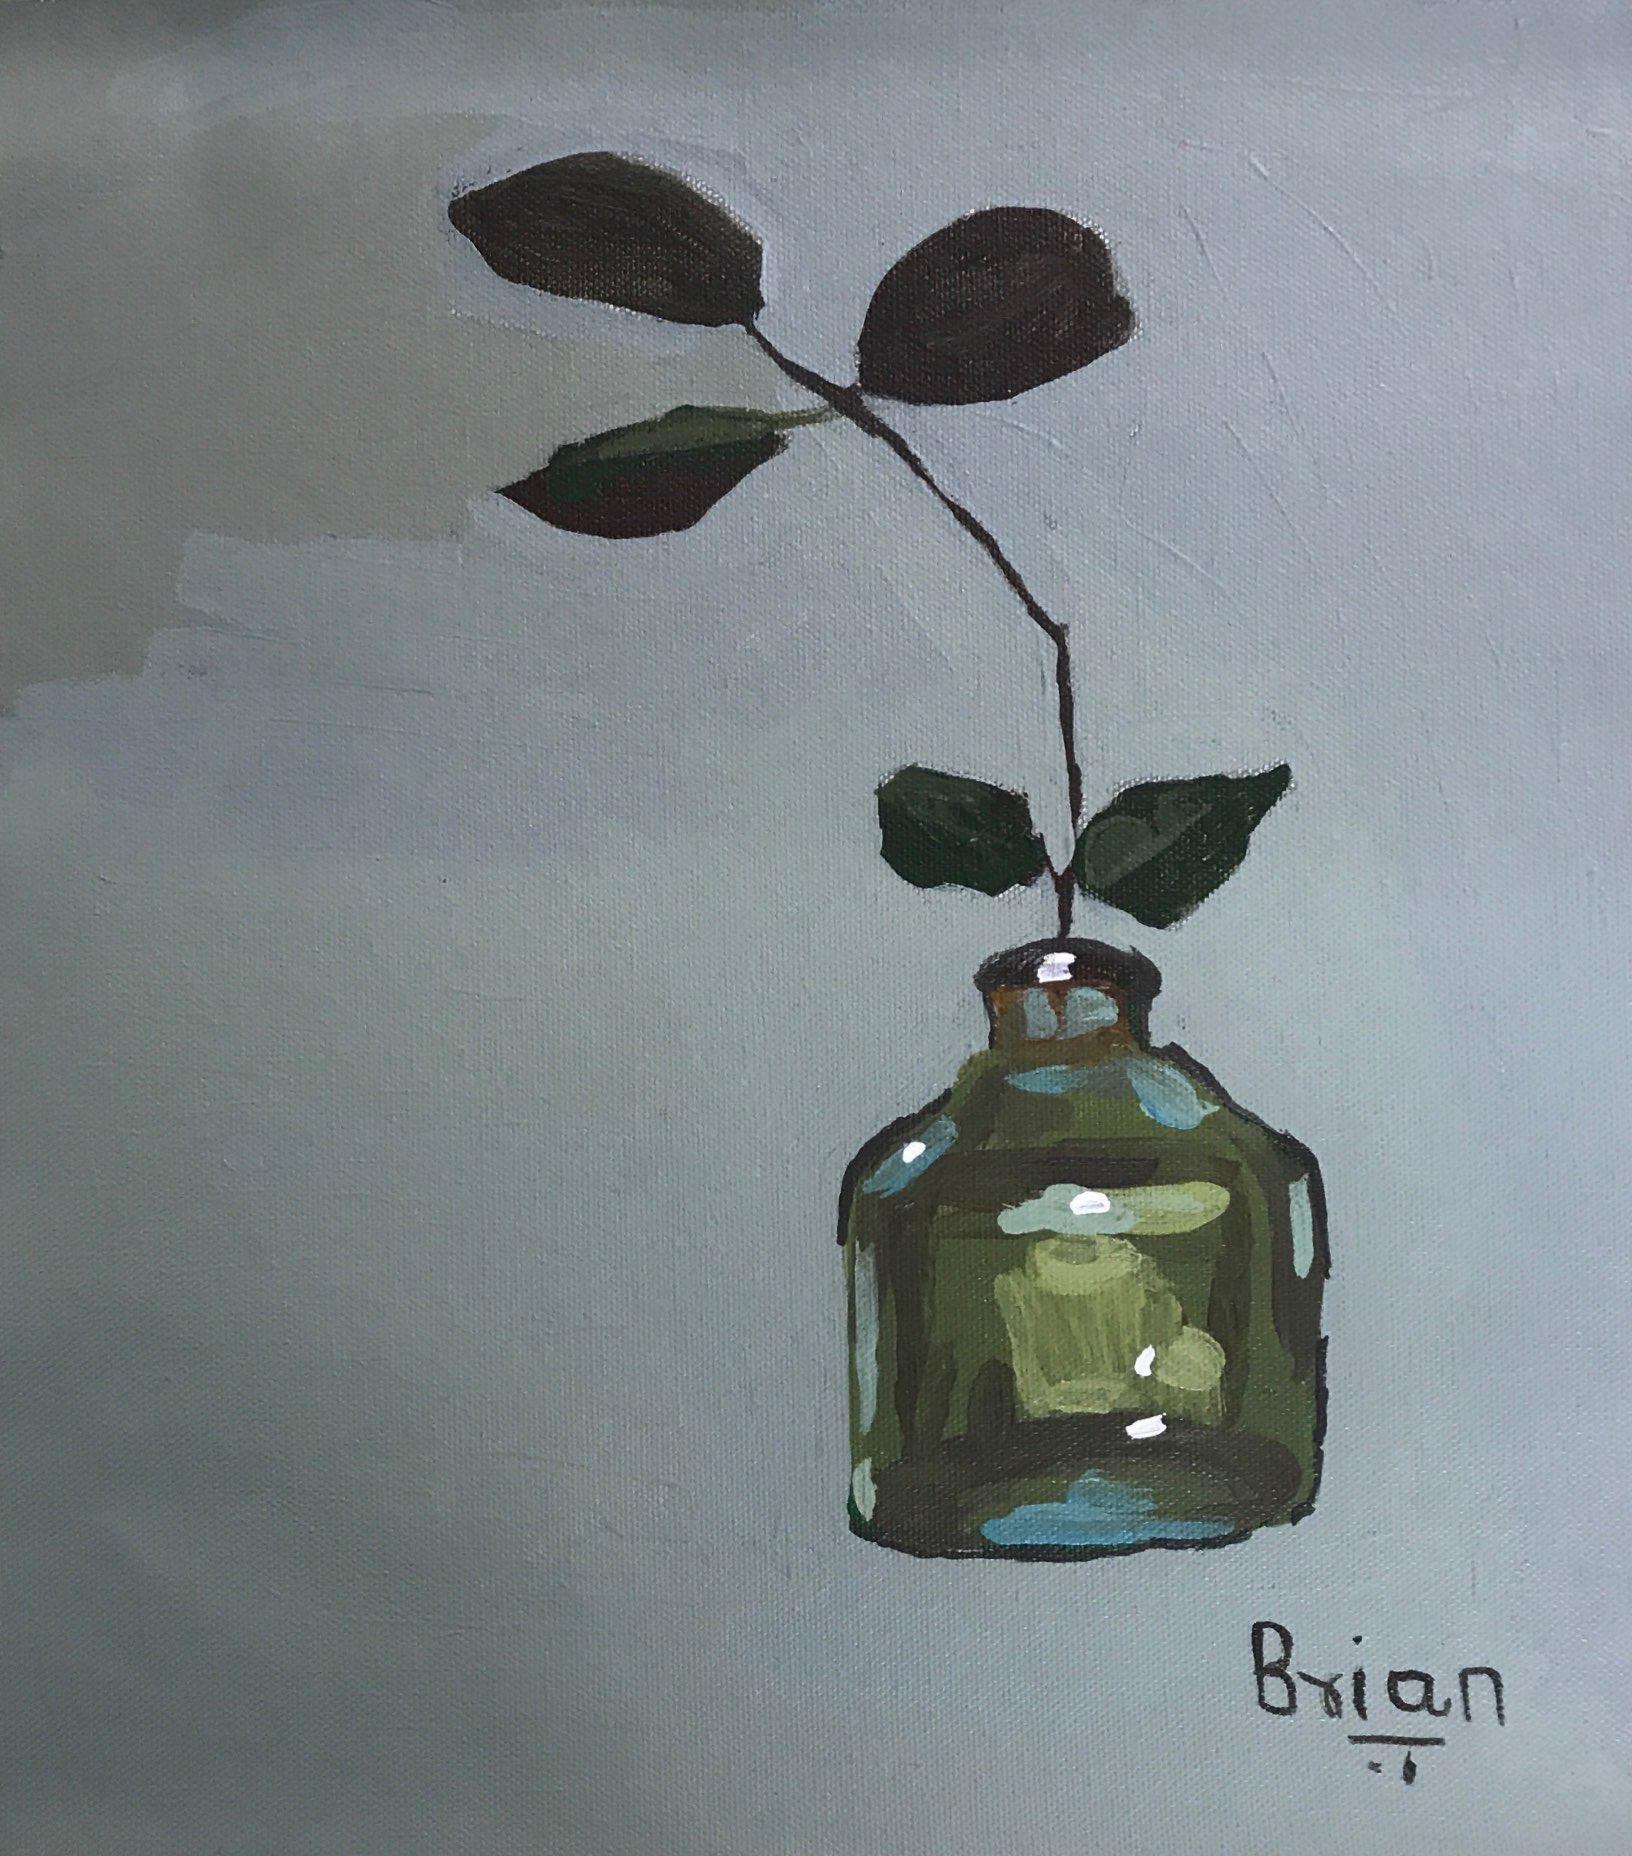 Brian Varghese Pradeep